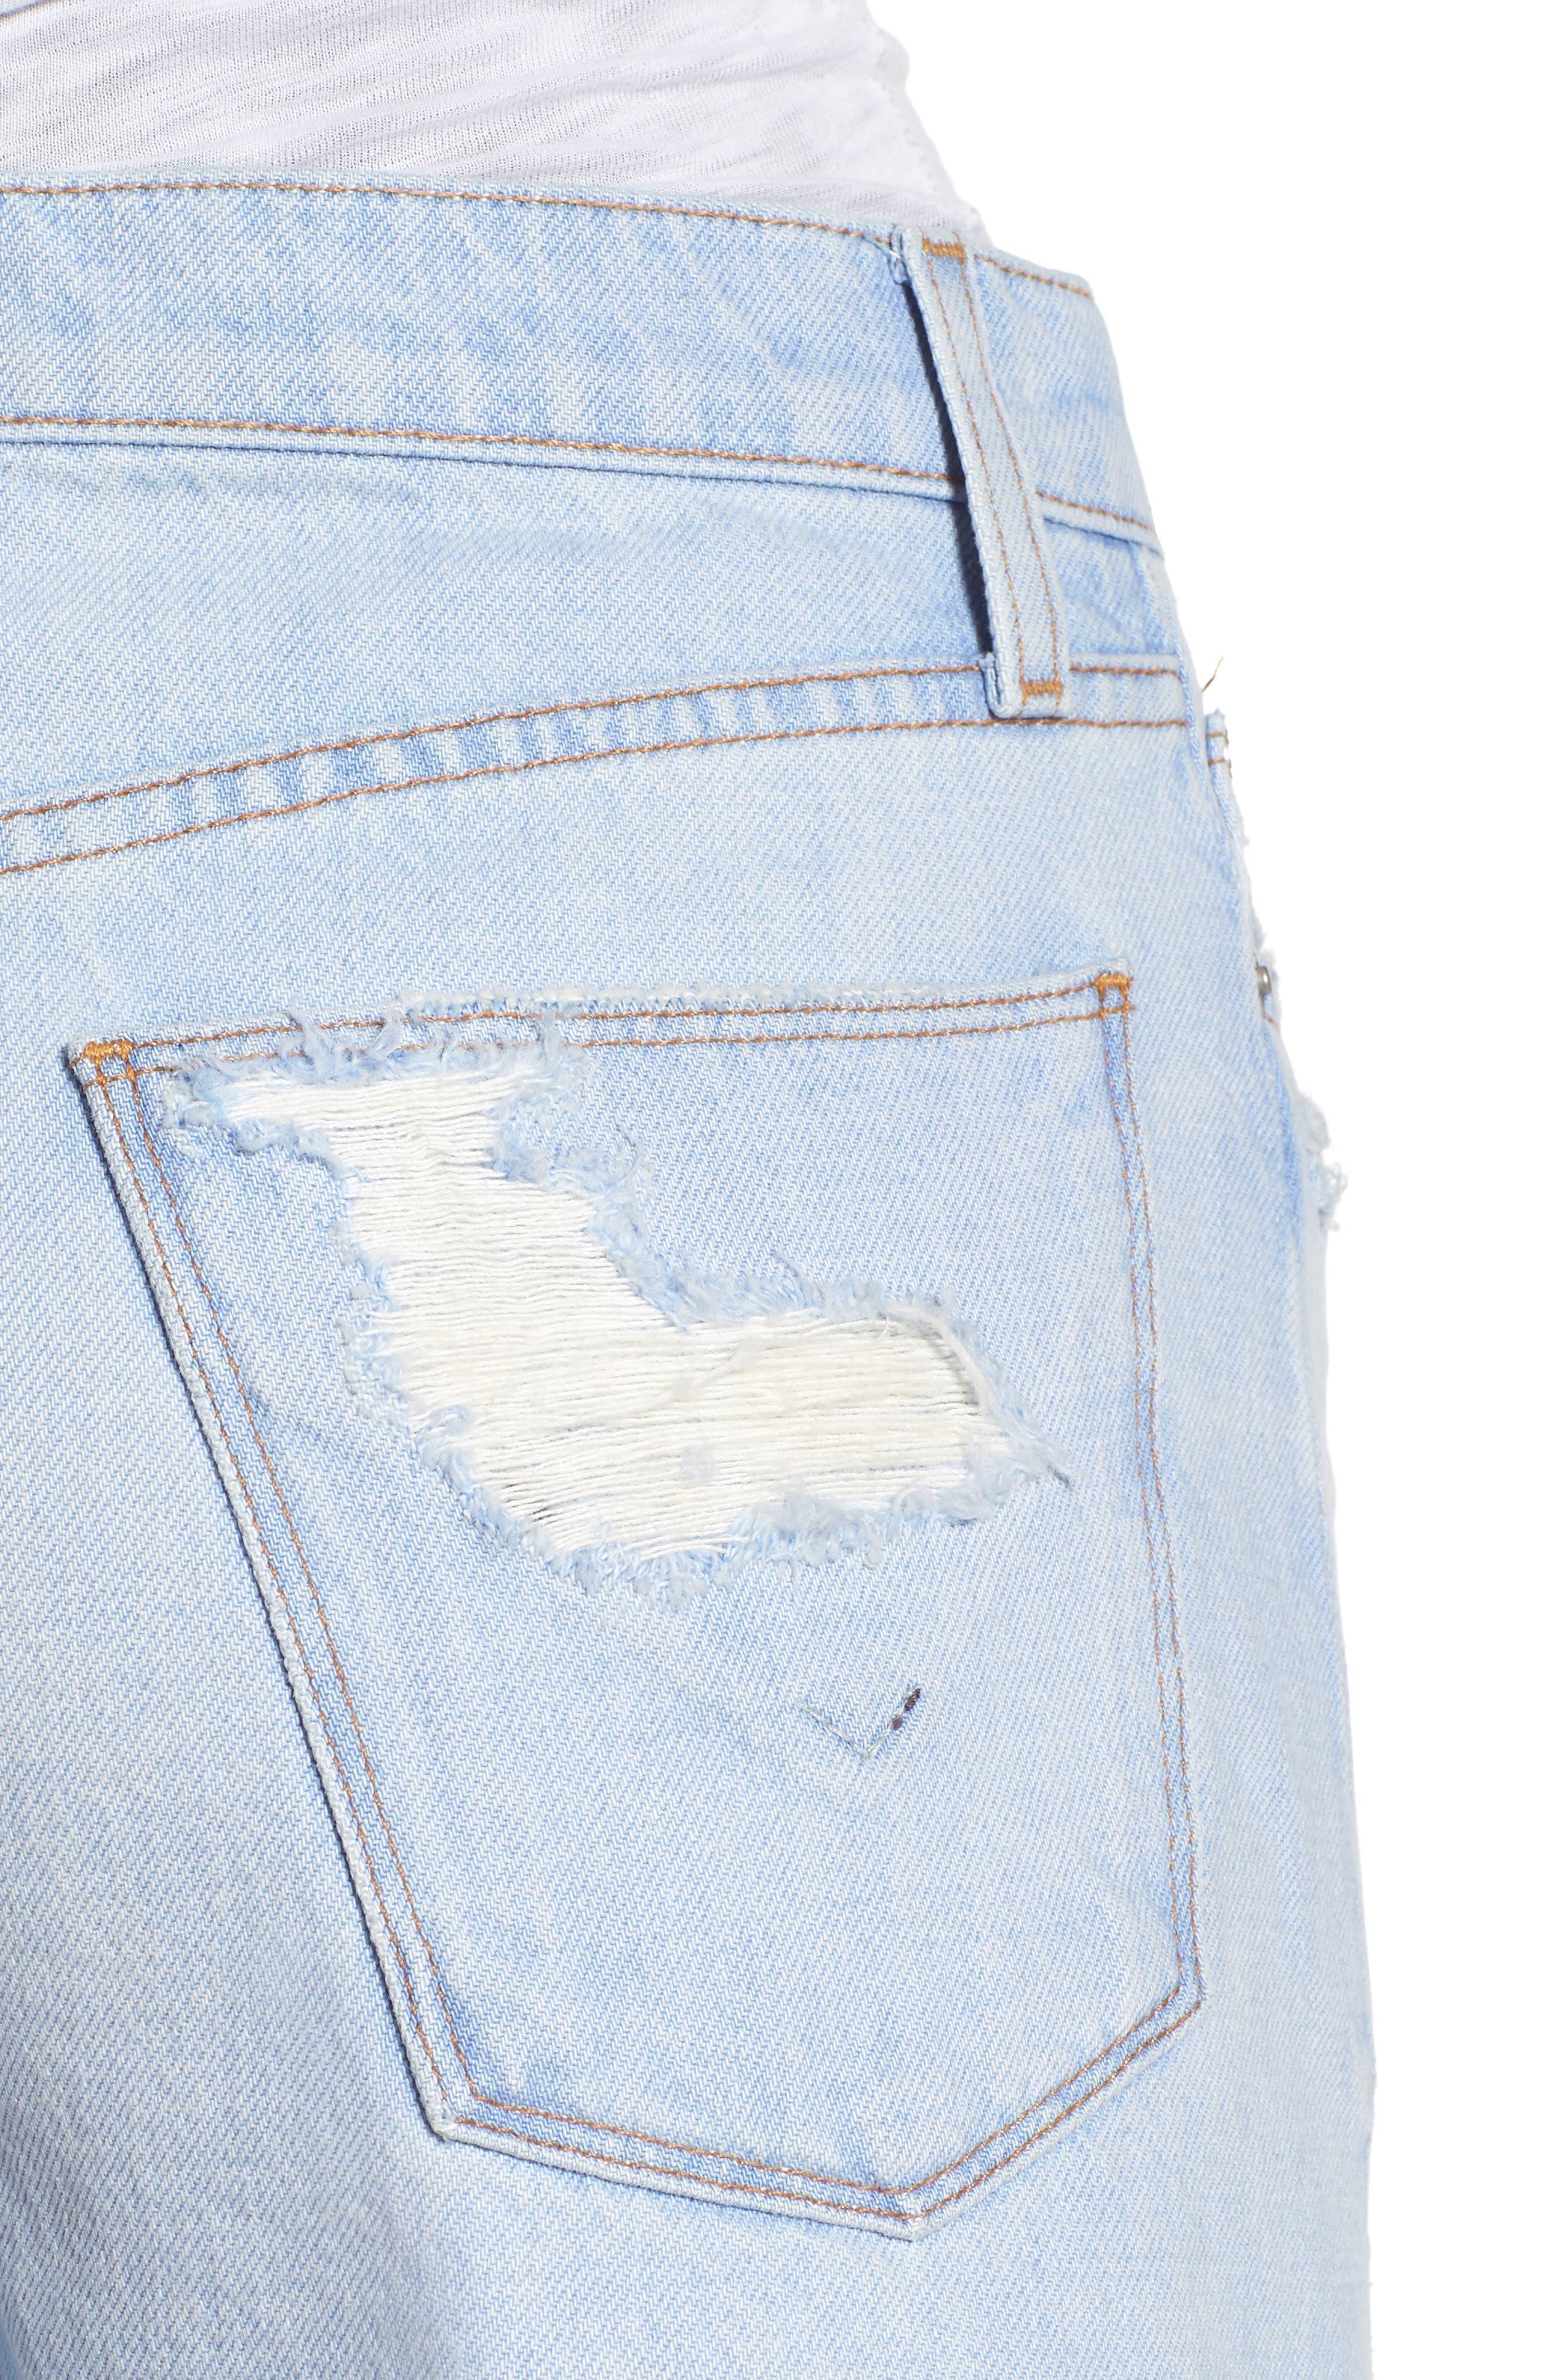 Sade Cutoff Denim Shorts,                             Alternate thumbnail 4, color,                             460